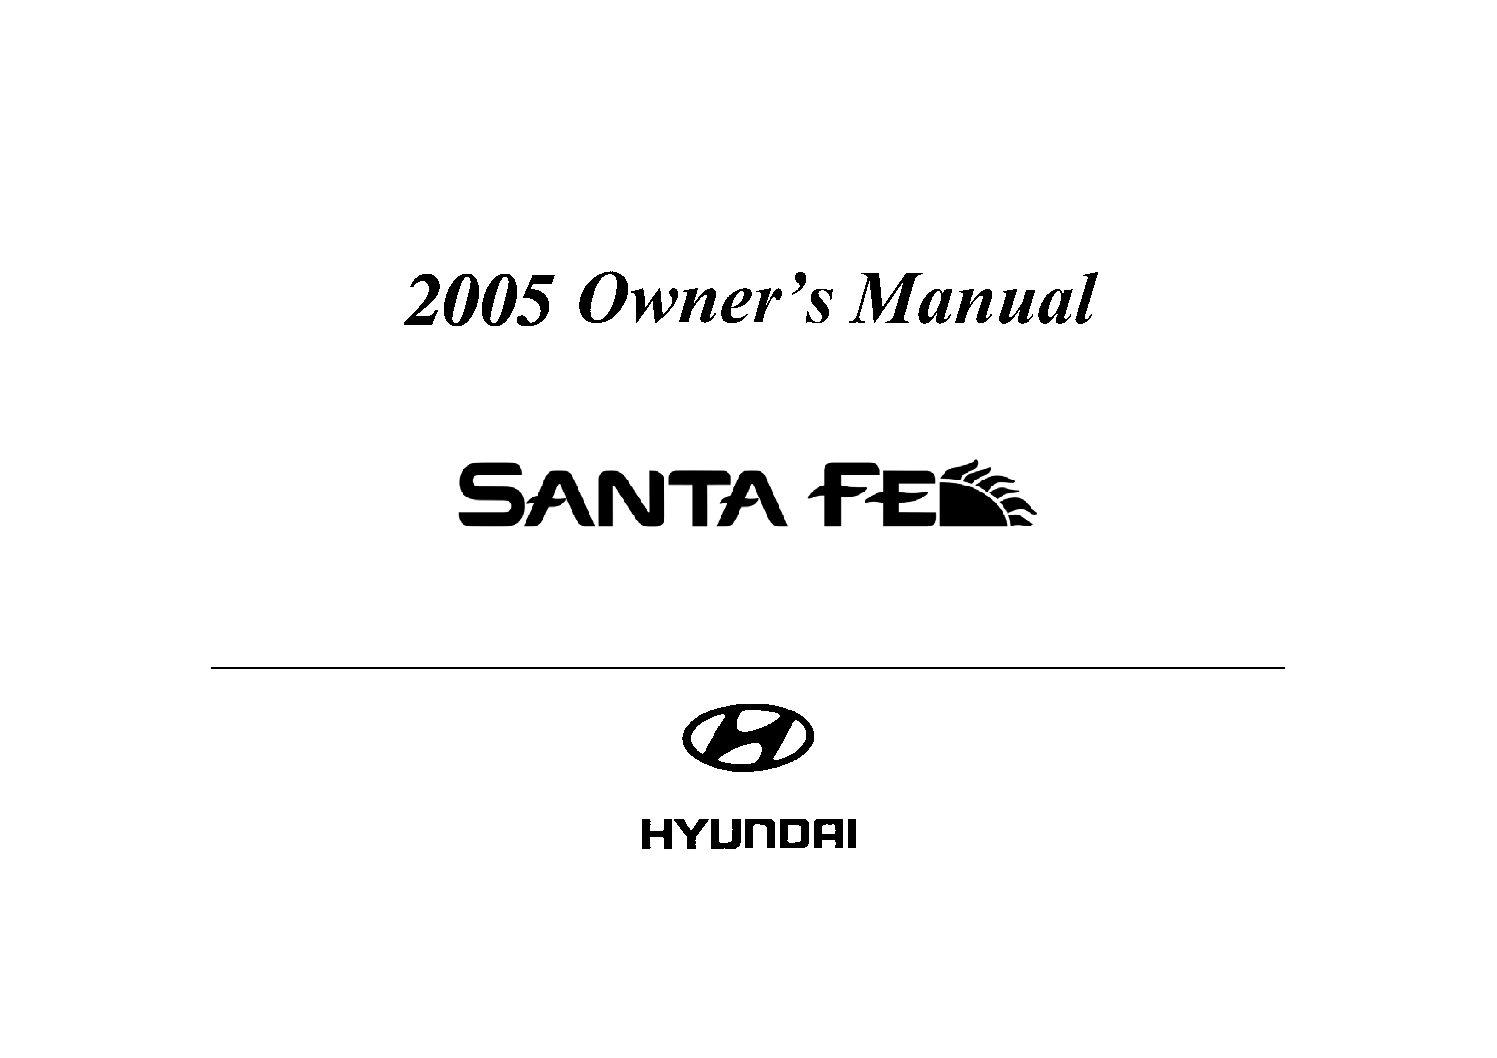 2005 hyundai santa fe owners manual just give me the damn manual rh justgivemethedamnmanual com 2005 hyundai santa fe repair manual pdf 2005 hyundai santa fe owners manual